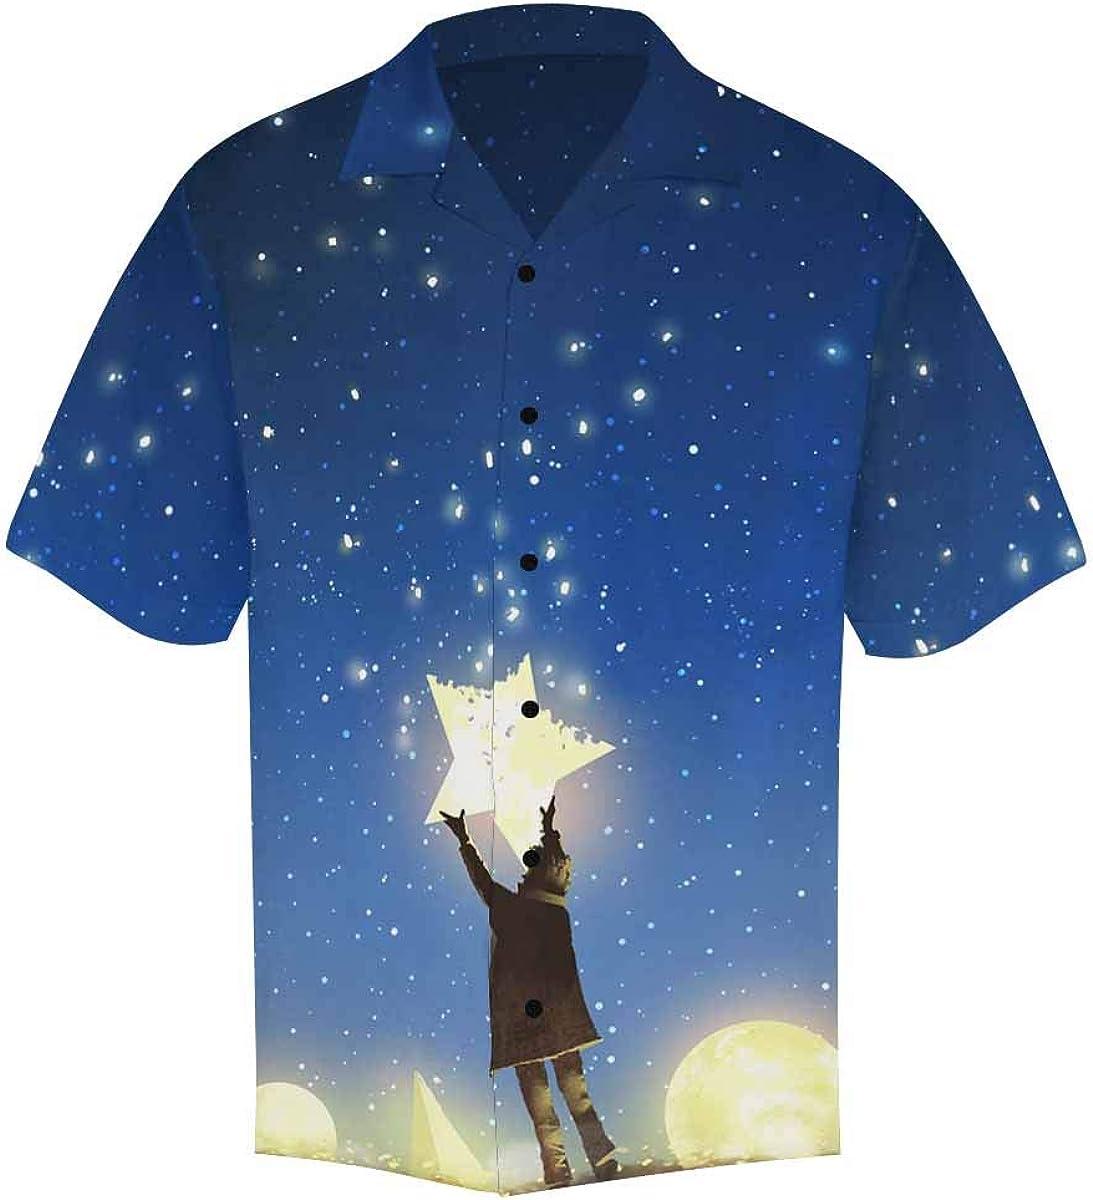 InterestPrint Men's Casual Button Down Short Sleeve Colored Space Nebula Hawaiian Shirt (S-5XL)